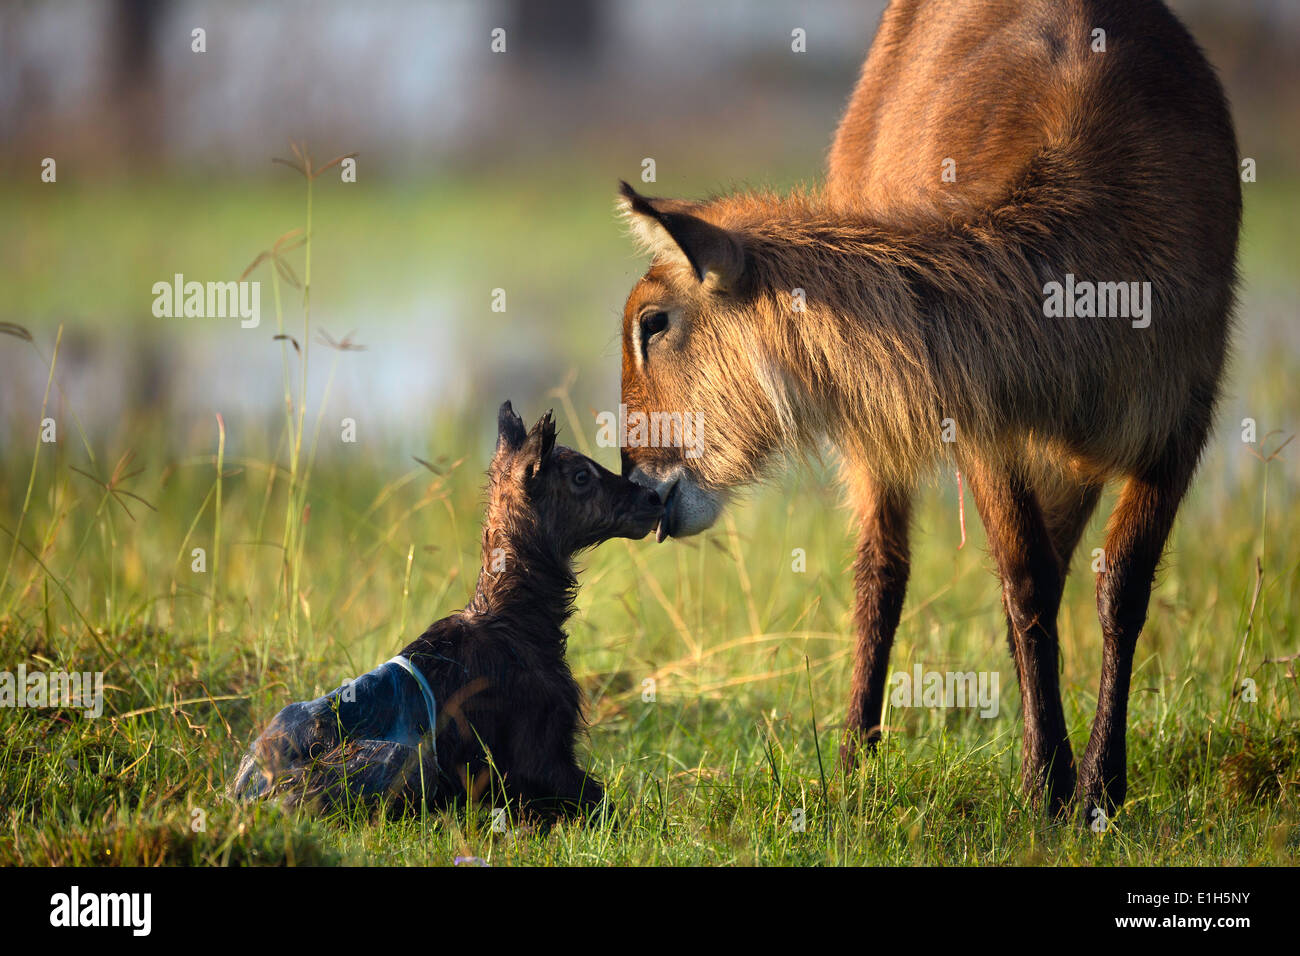 Mother and baby waterbuck (Kobus ellipsiprymnus), Lake Nakuru National Park, Kenya, Africa Stock Photo